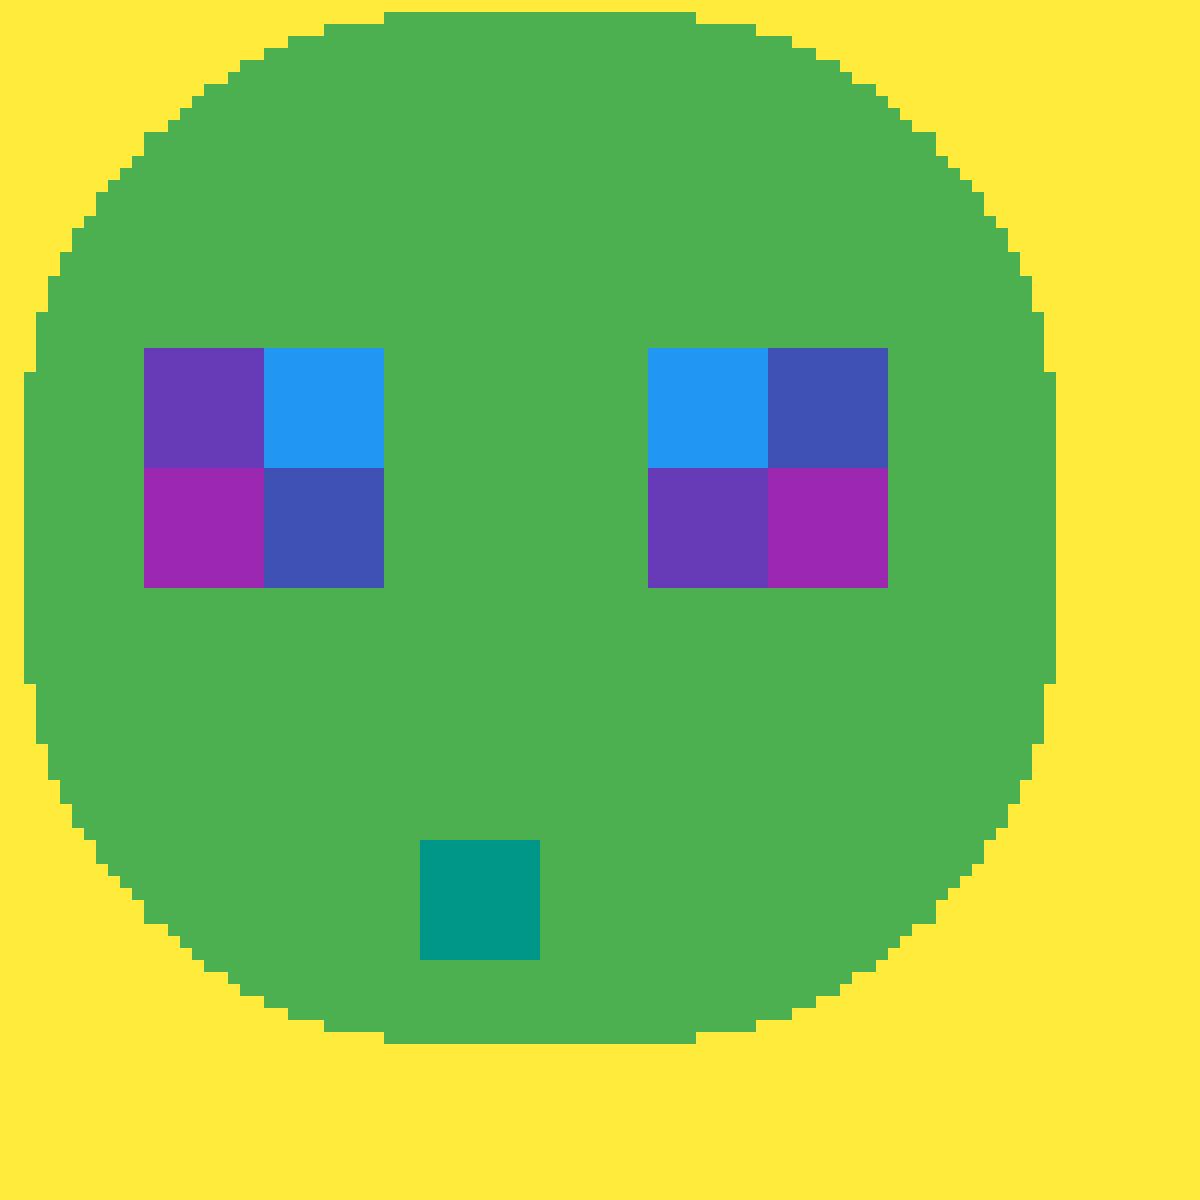 alien by badbabyboo